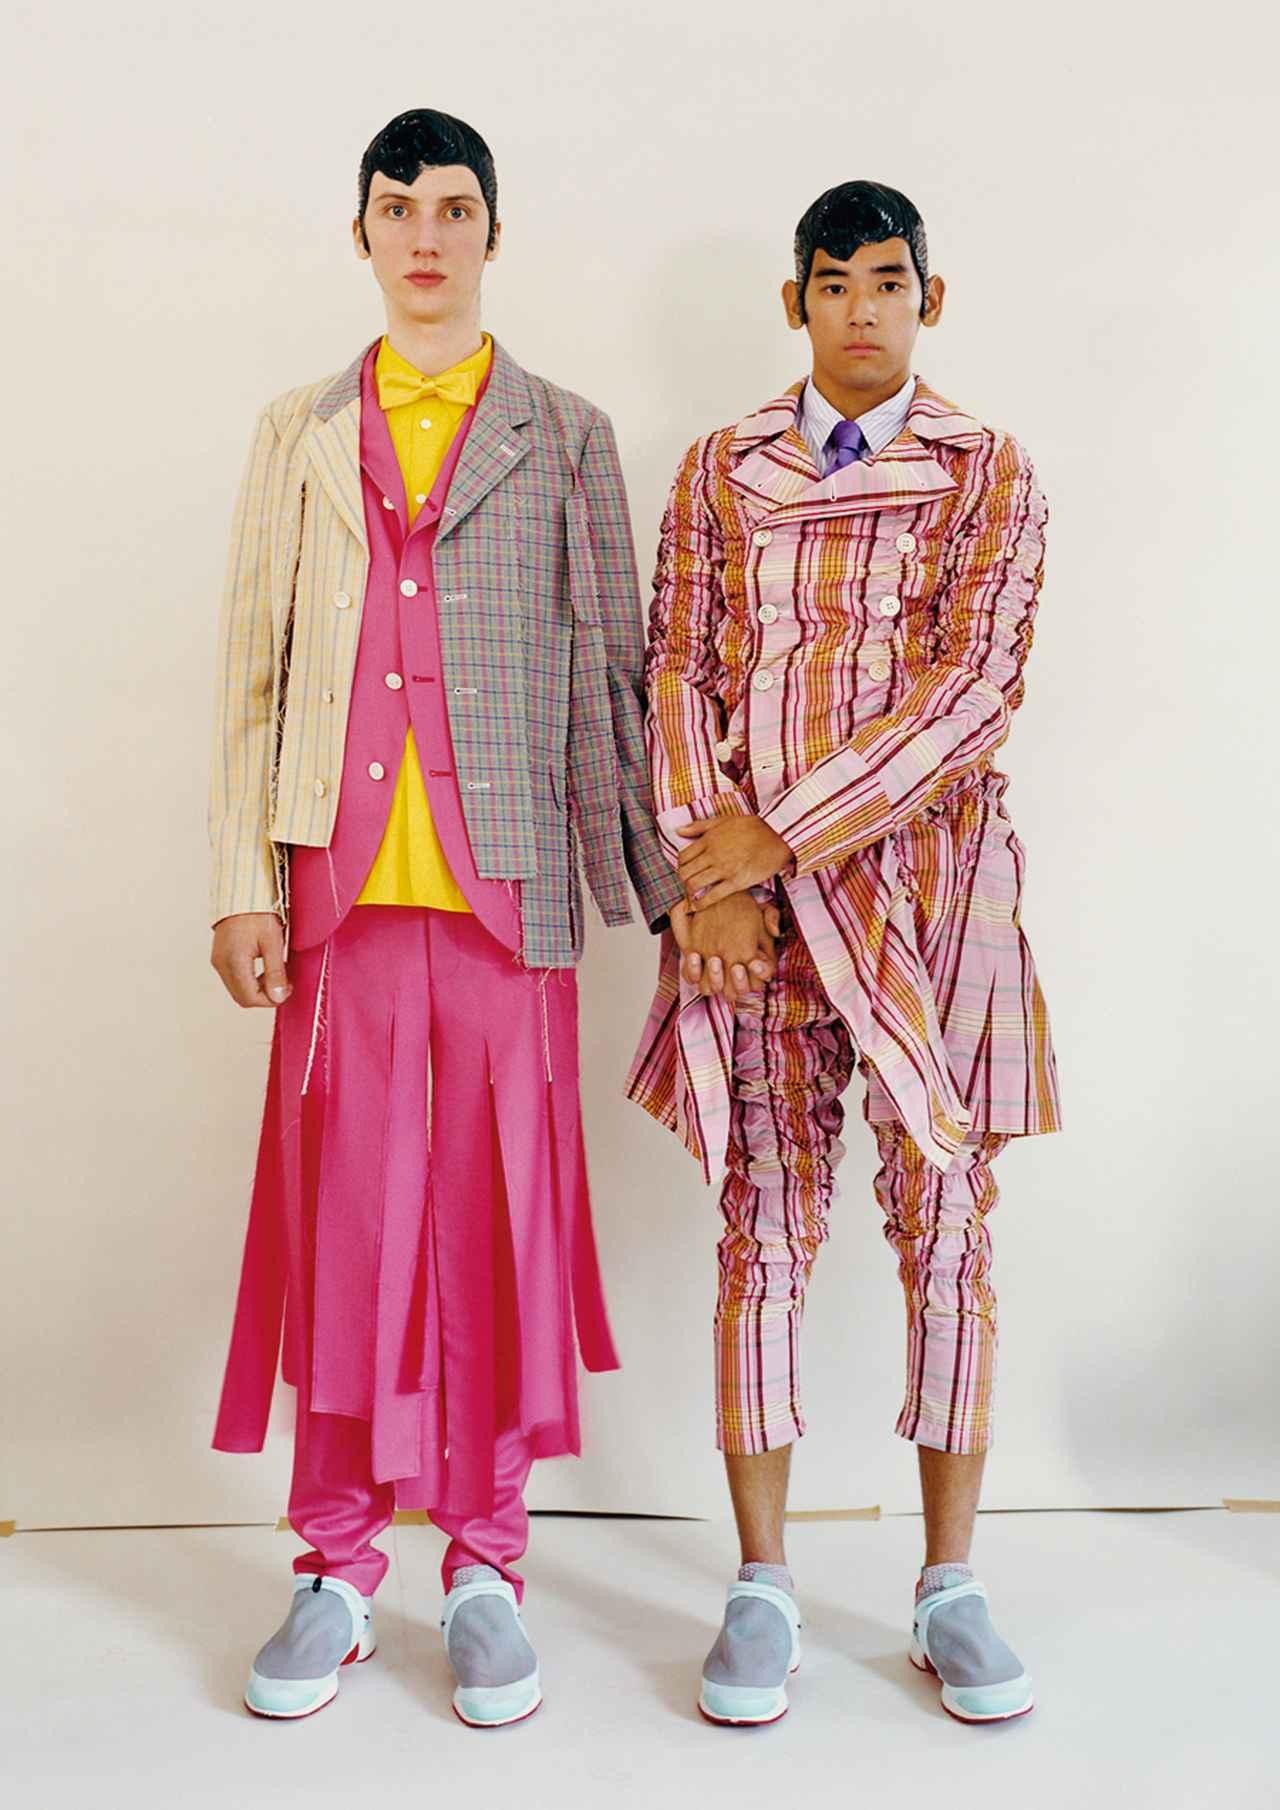 Images : 3番目の画像 - 「川久保 玲ーー ファッションの偉大なる解放者」のアルバム - T JAPAN:The New York Times Style Magazine 公式サイト